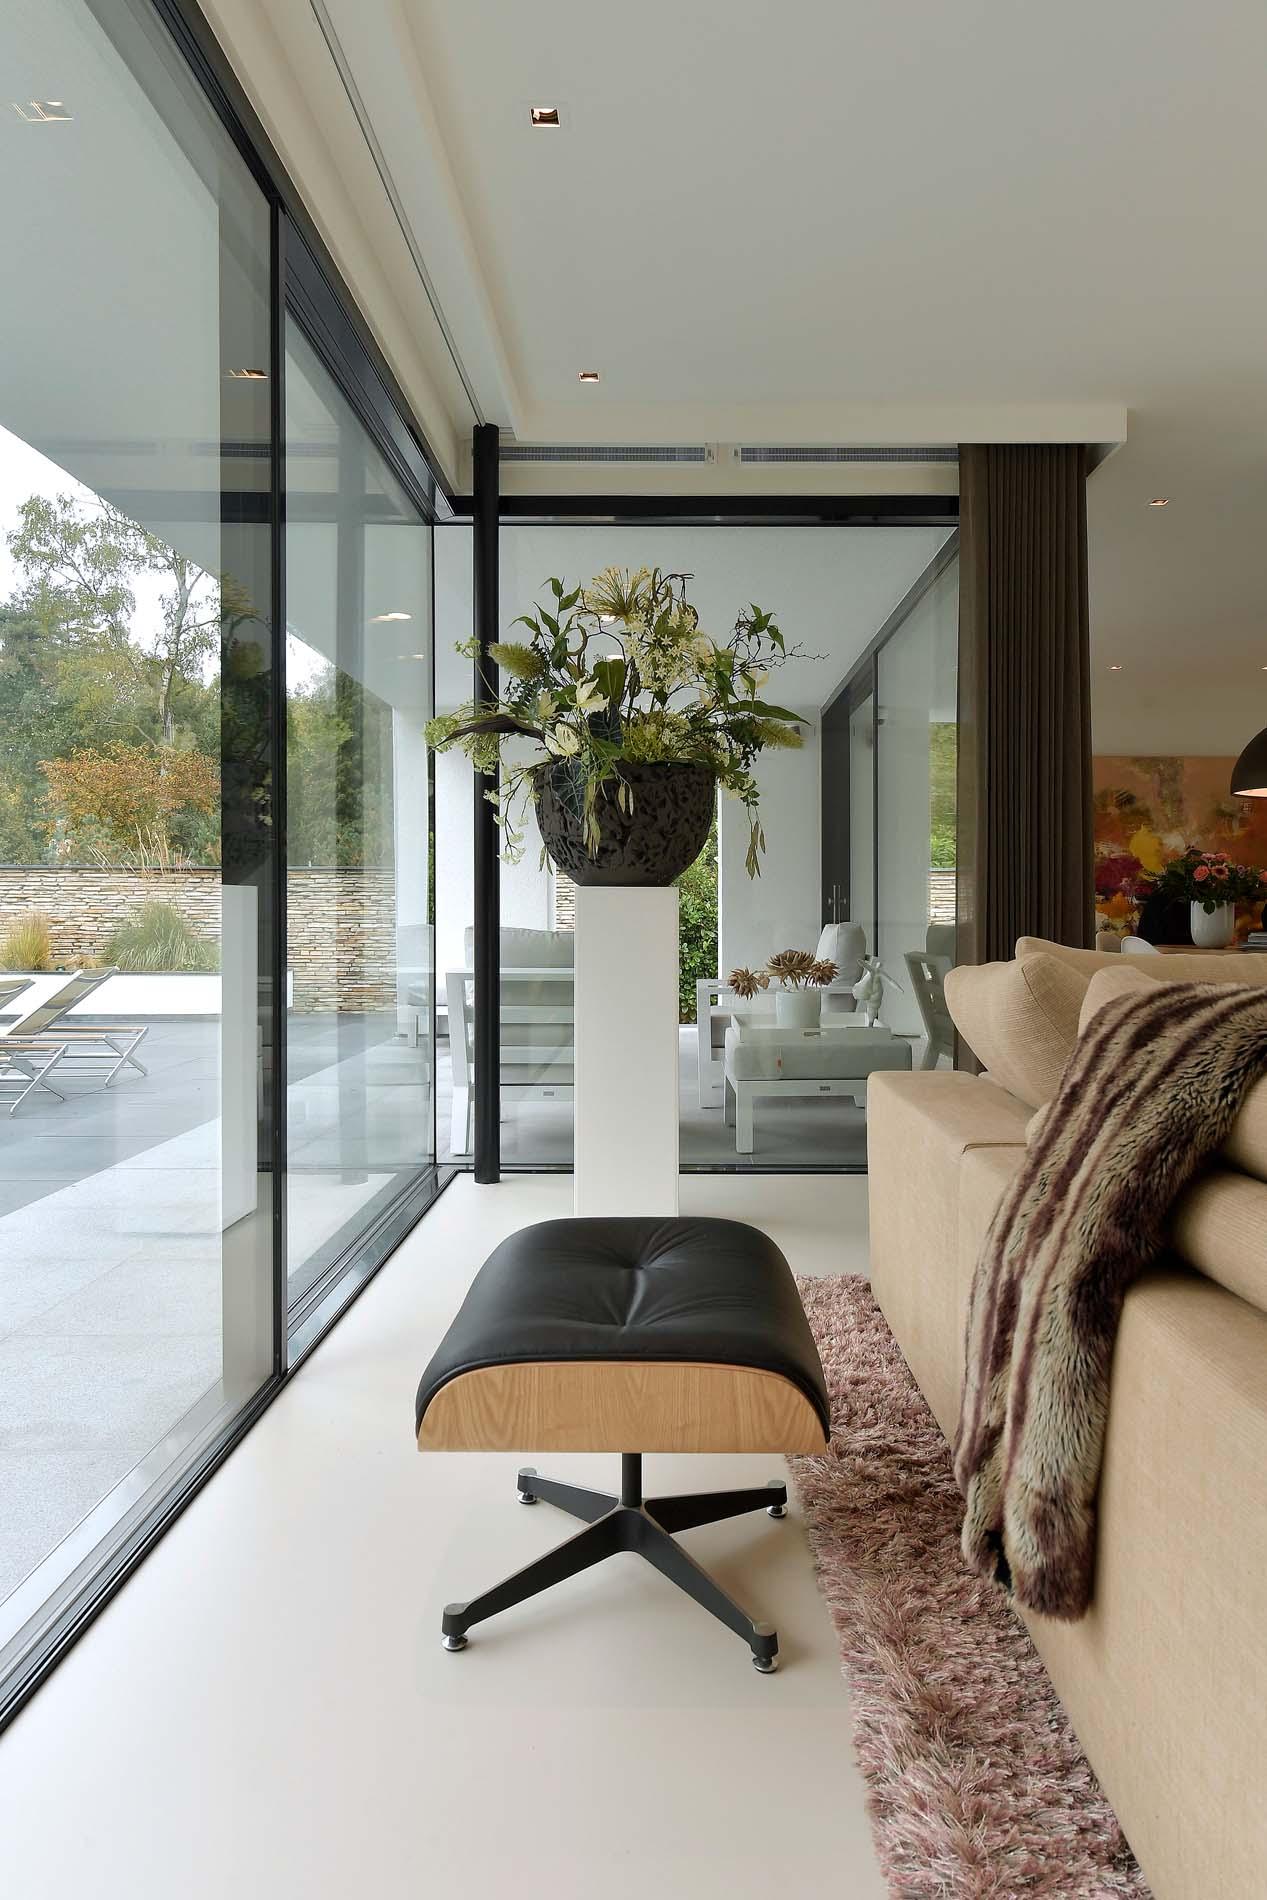 Moderne bungalow in de bossen The Art of Living, ASWA Keukens